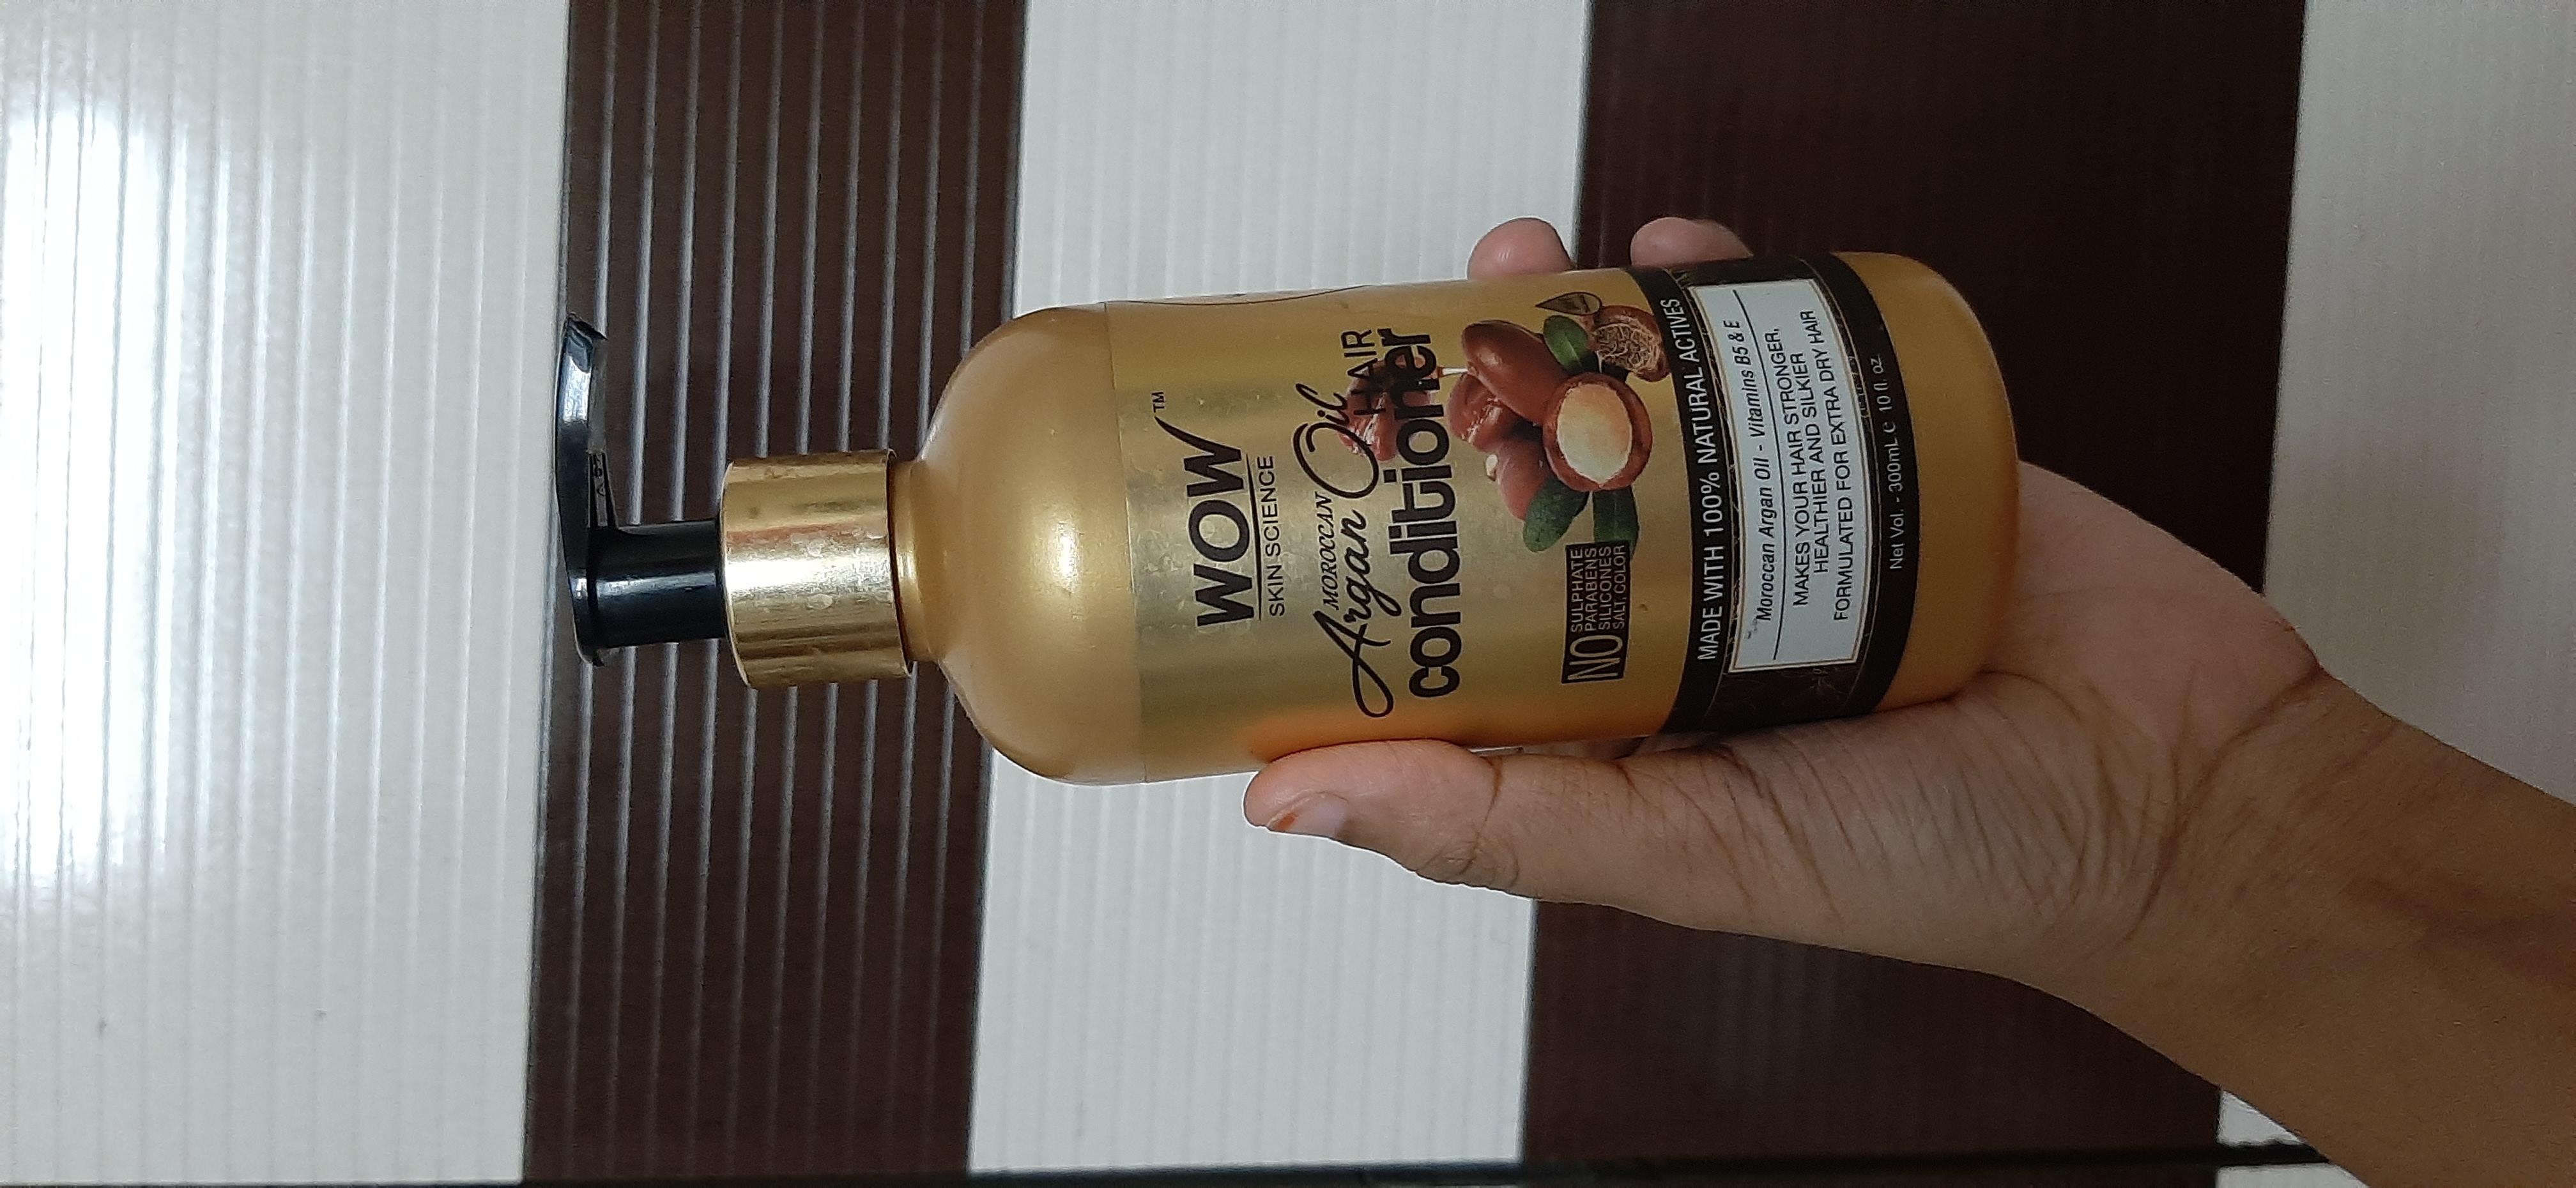 WOW Skin Science Moroccan Argan Oil Conditioner-Wow moroccan Argan oil conditioner-By samira_haider-1